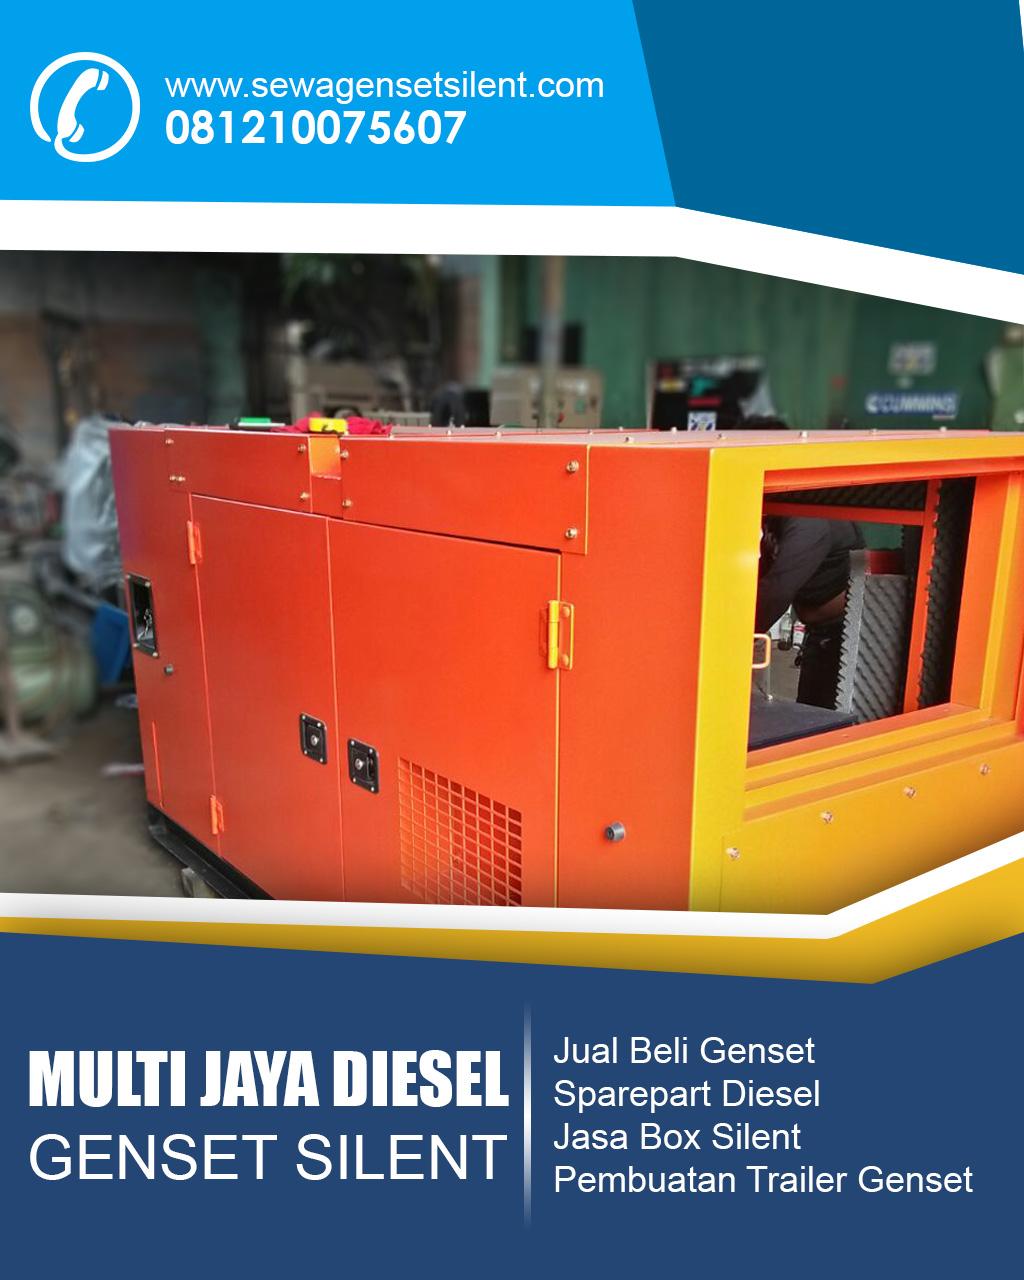 Profil Multi Jaya Diesel